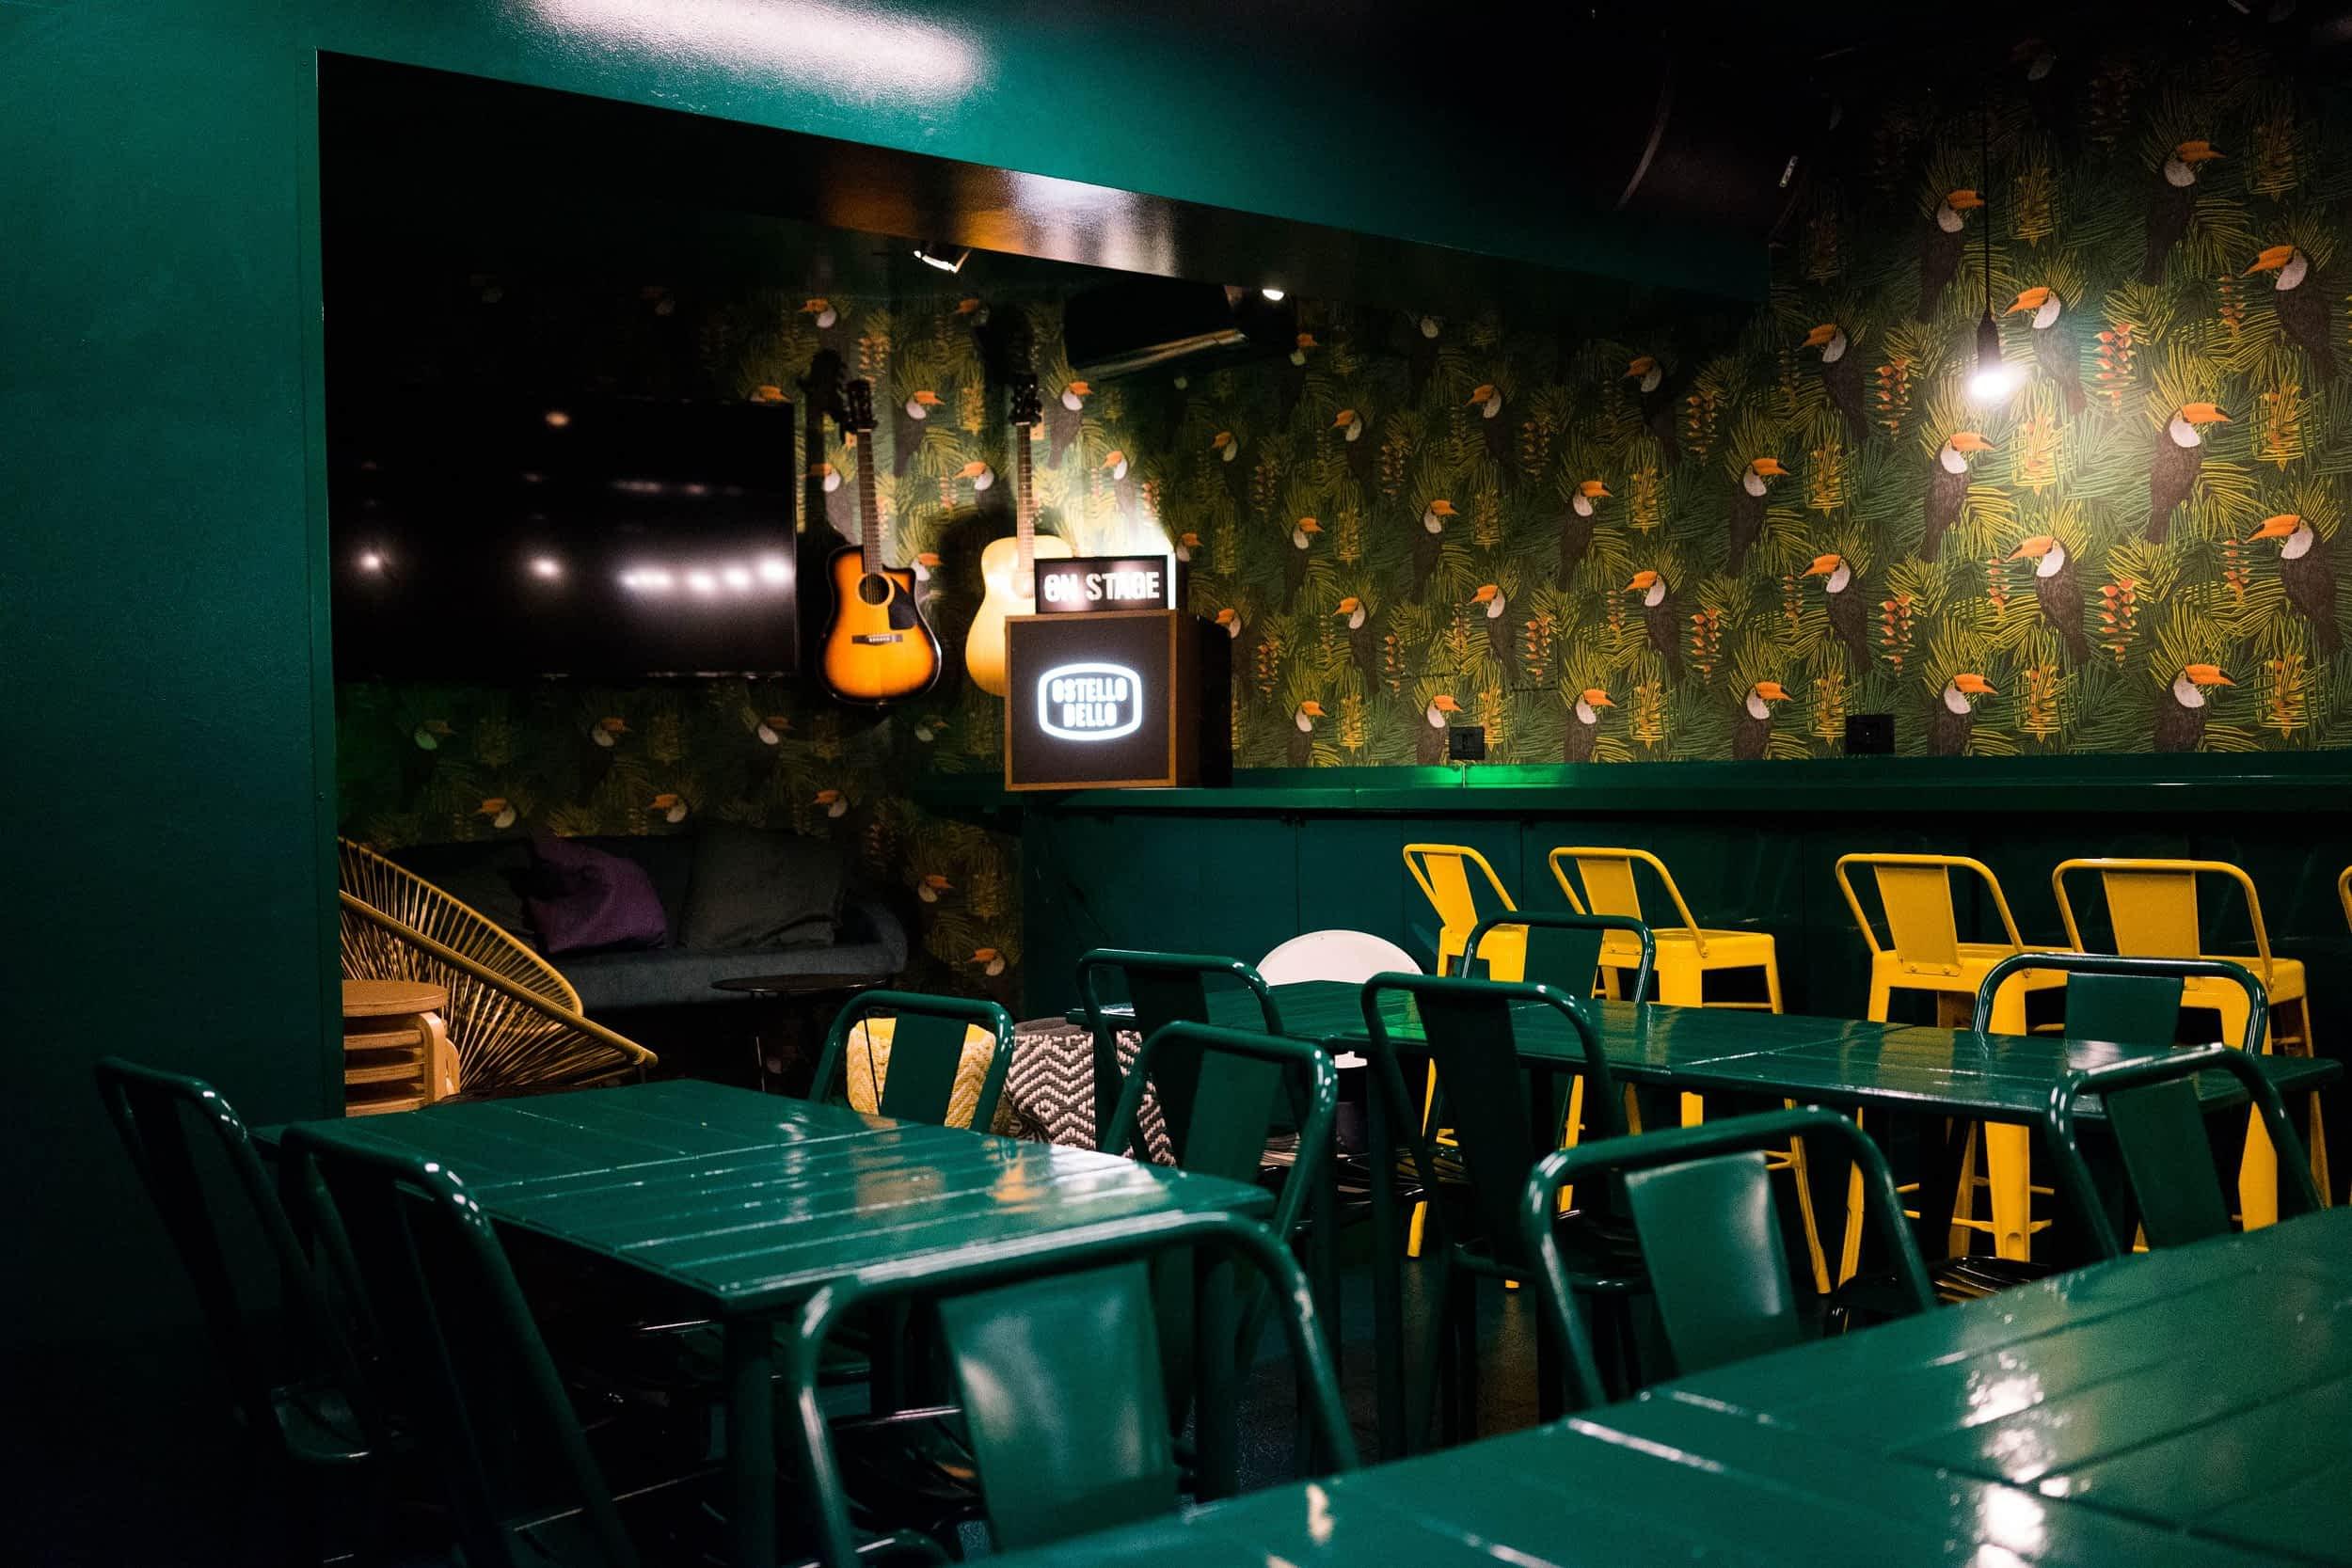 Ostello_Bello_Milano Zimmer leere Bar